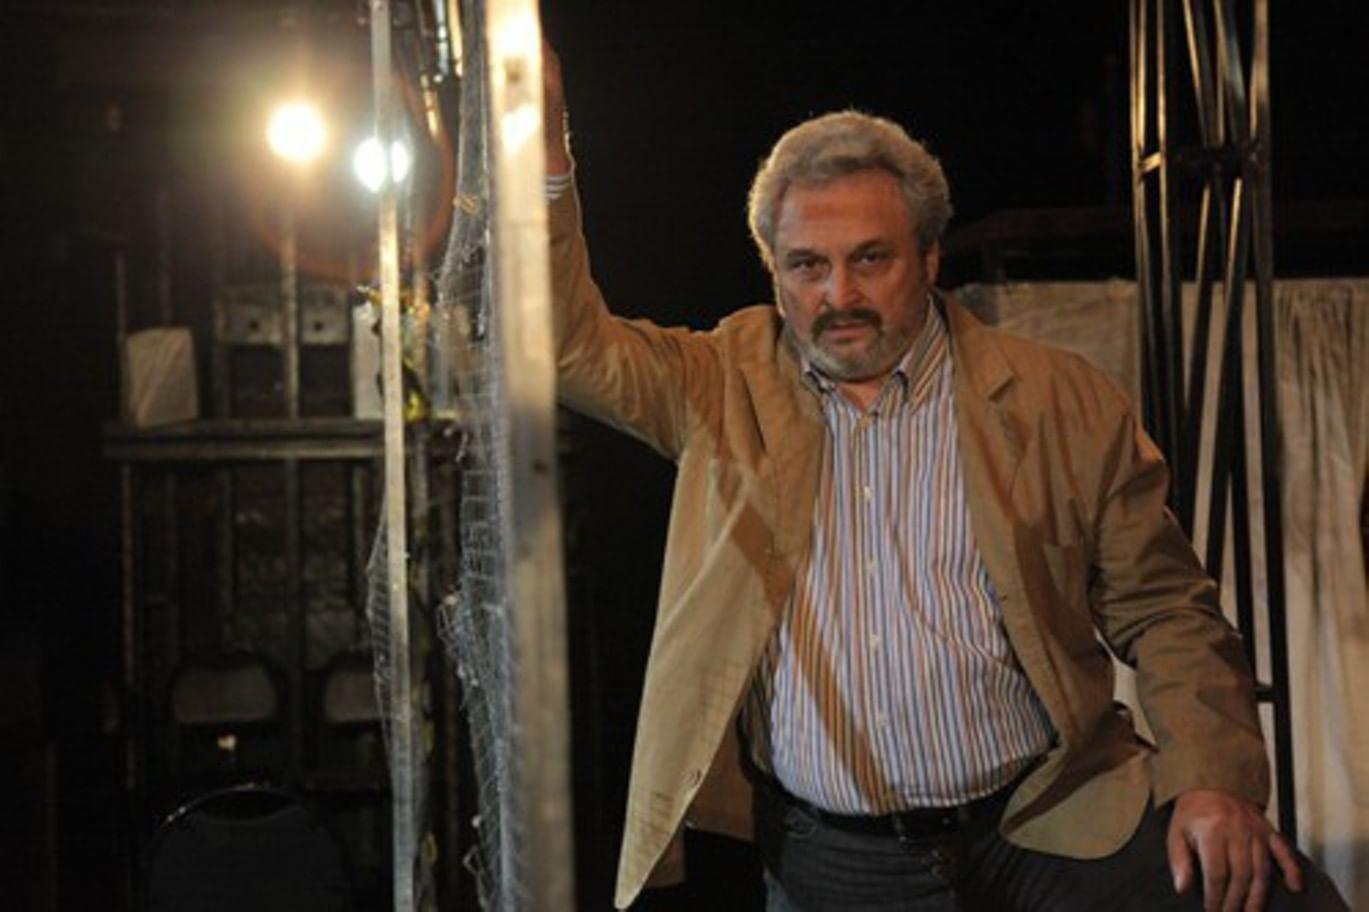 Юрий Александров: «Театр должен оставаться храмом». Галерея 1